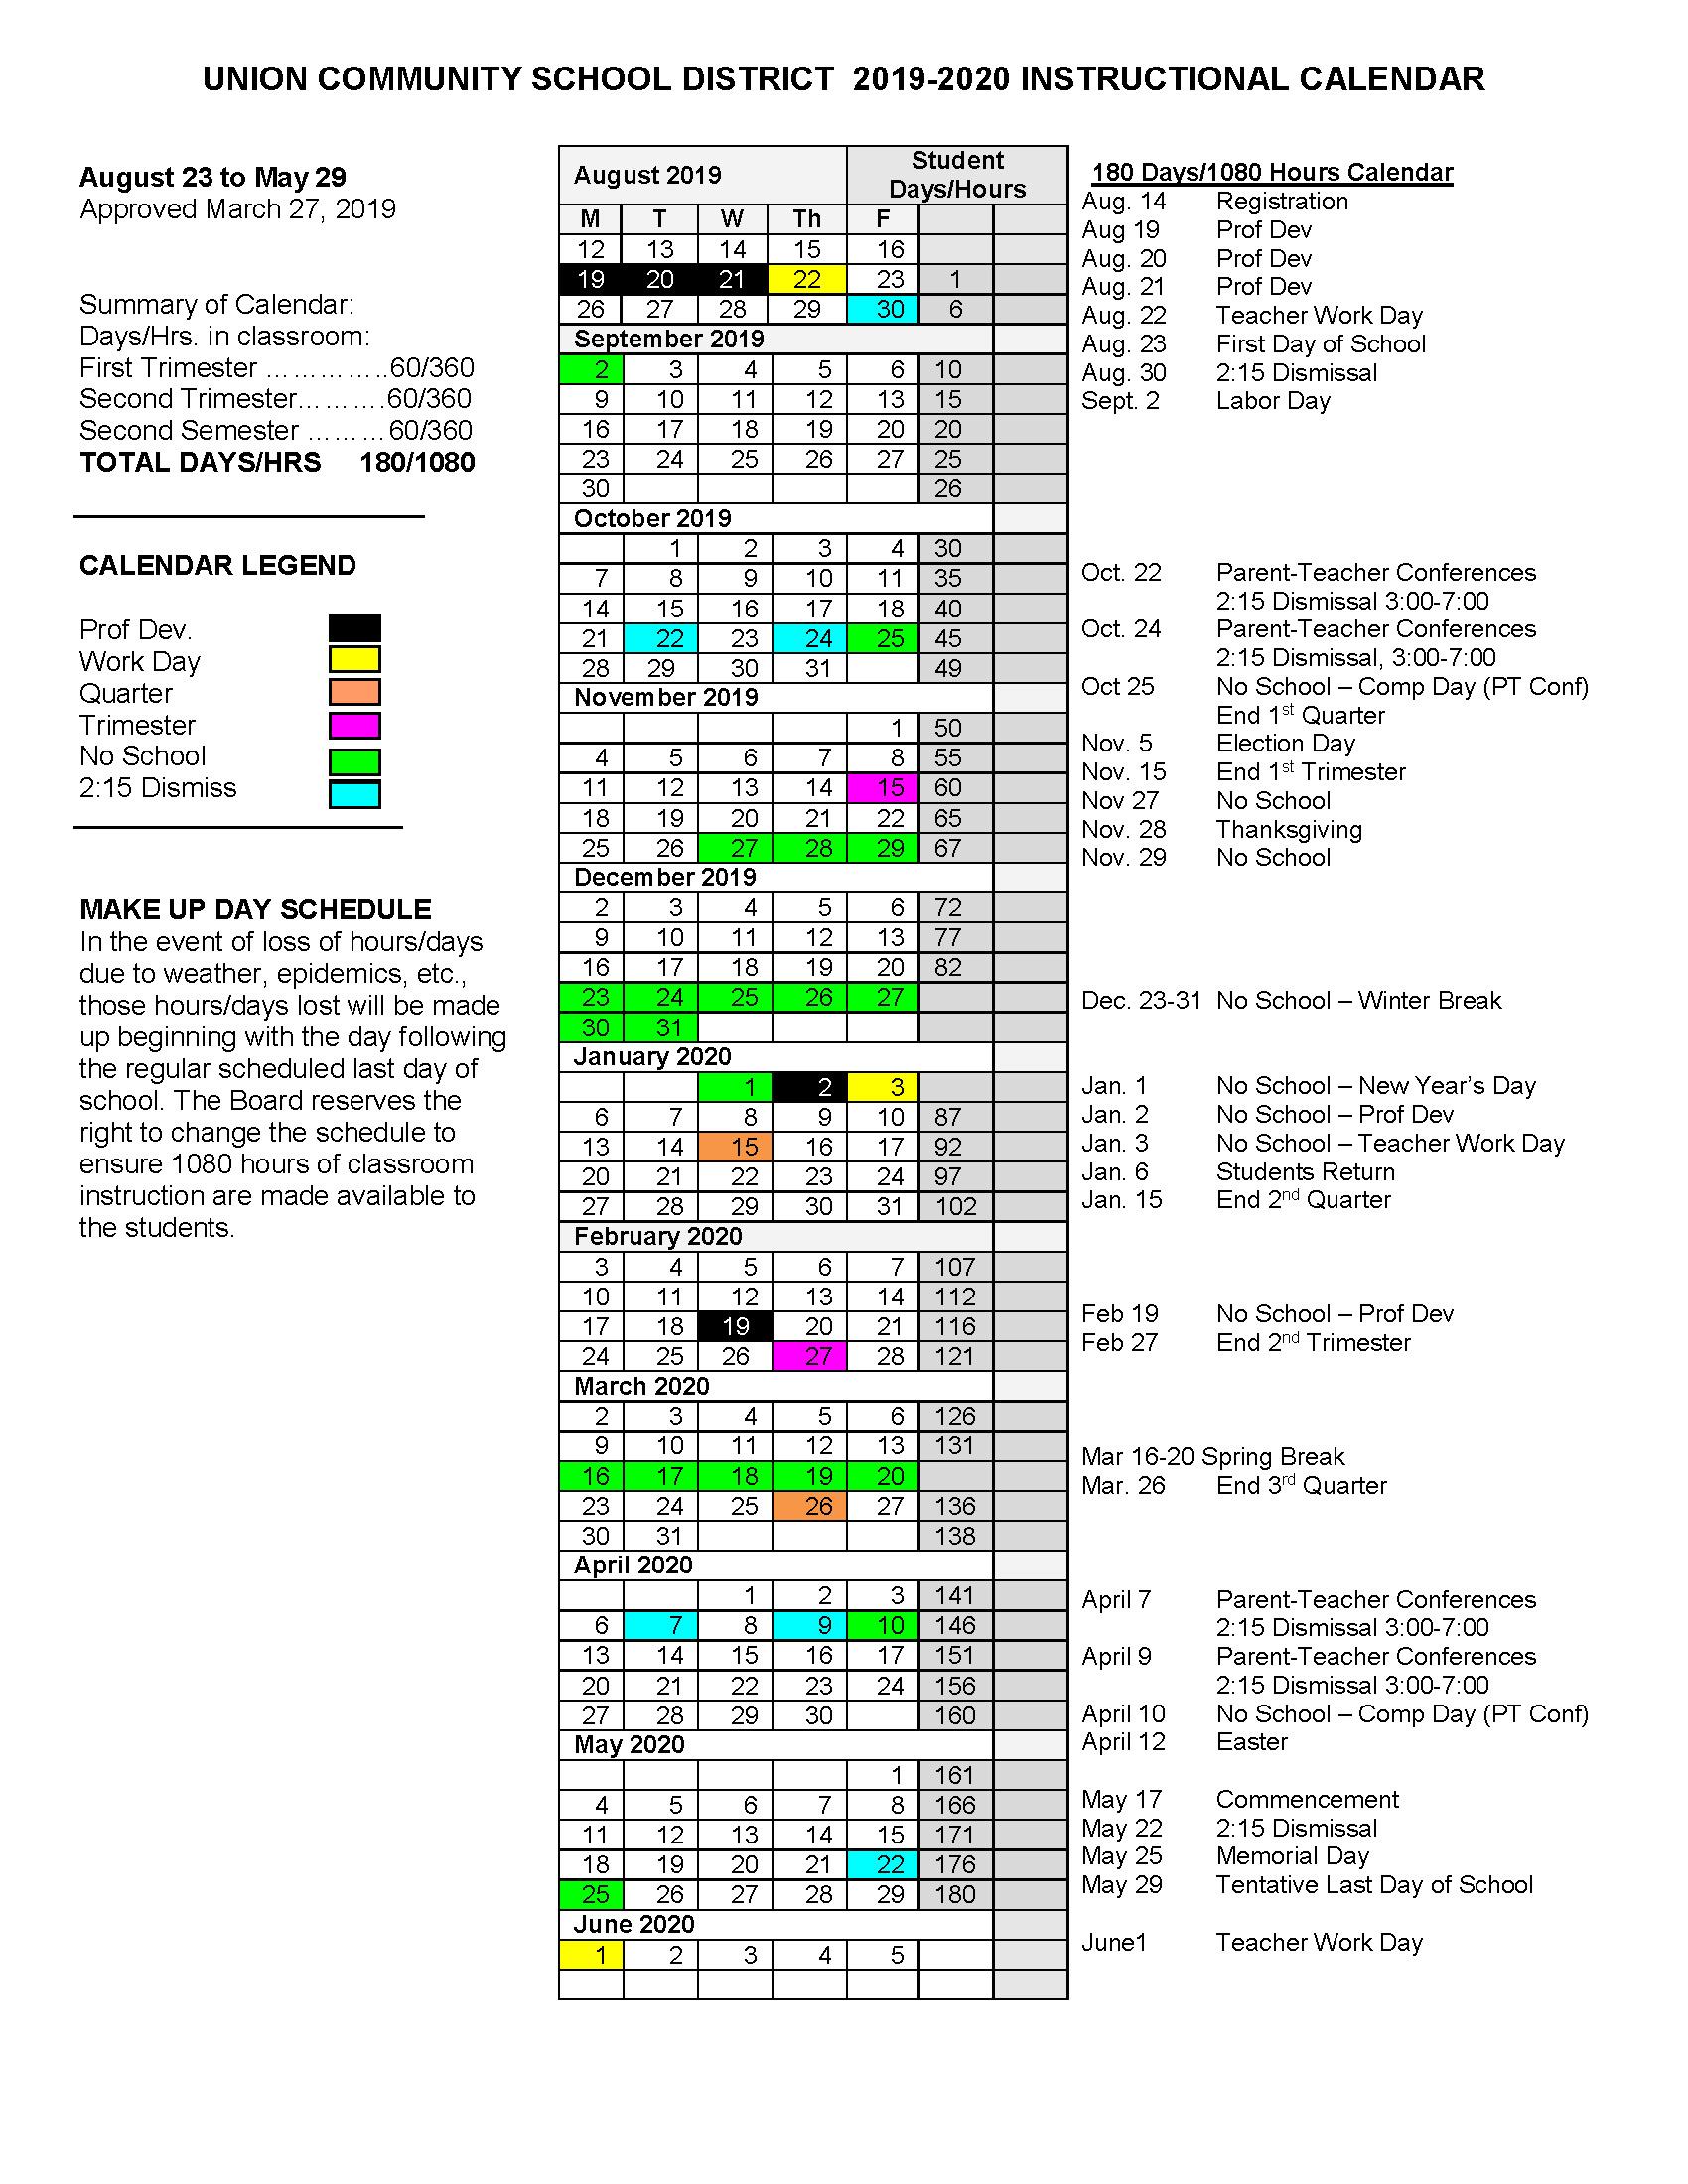 2019 2020 Approved Calendar - Union Community School District Within Cedar Rapids School District Calendar